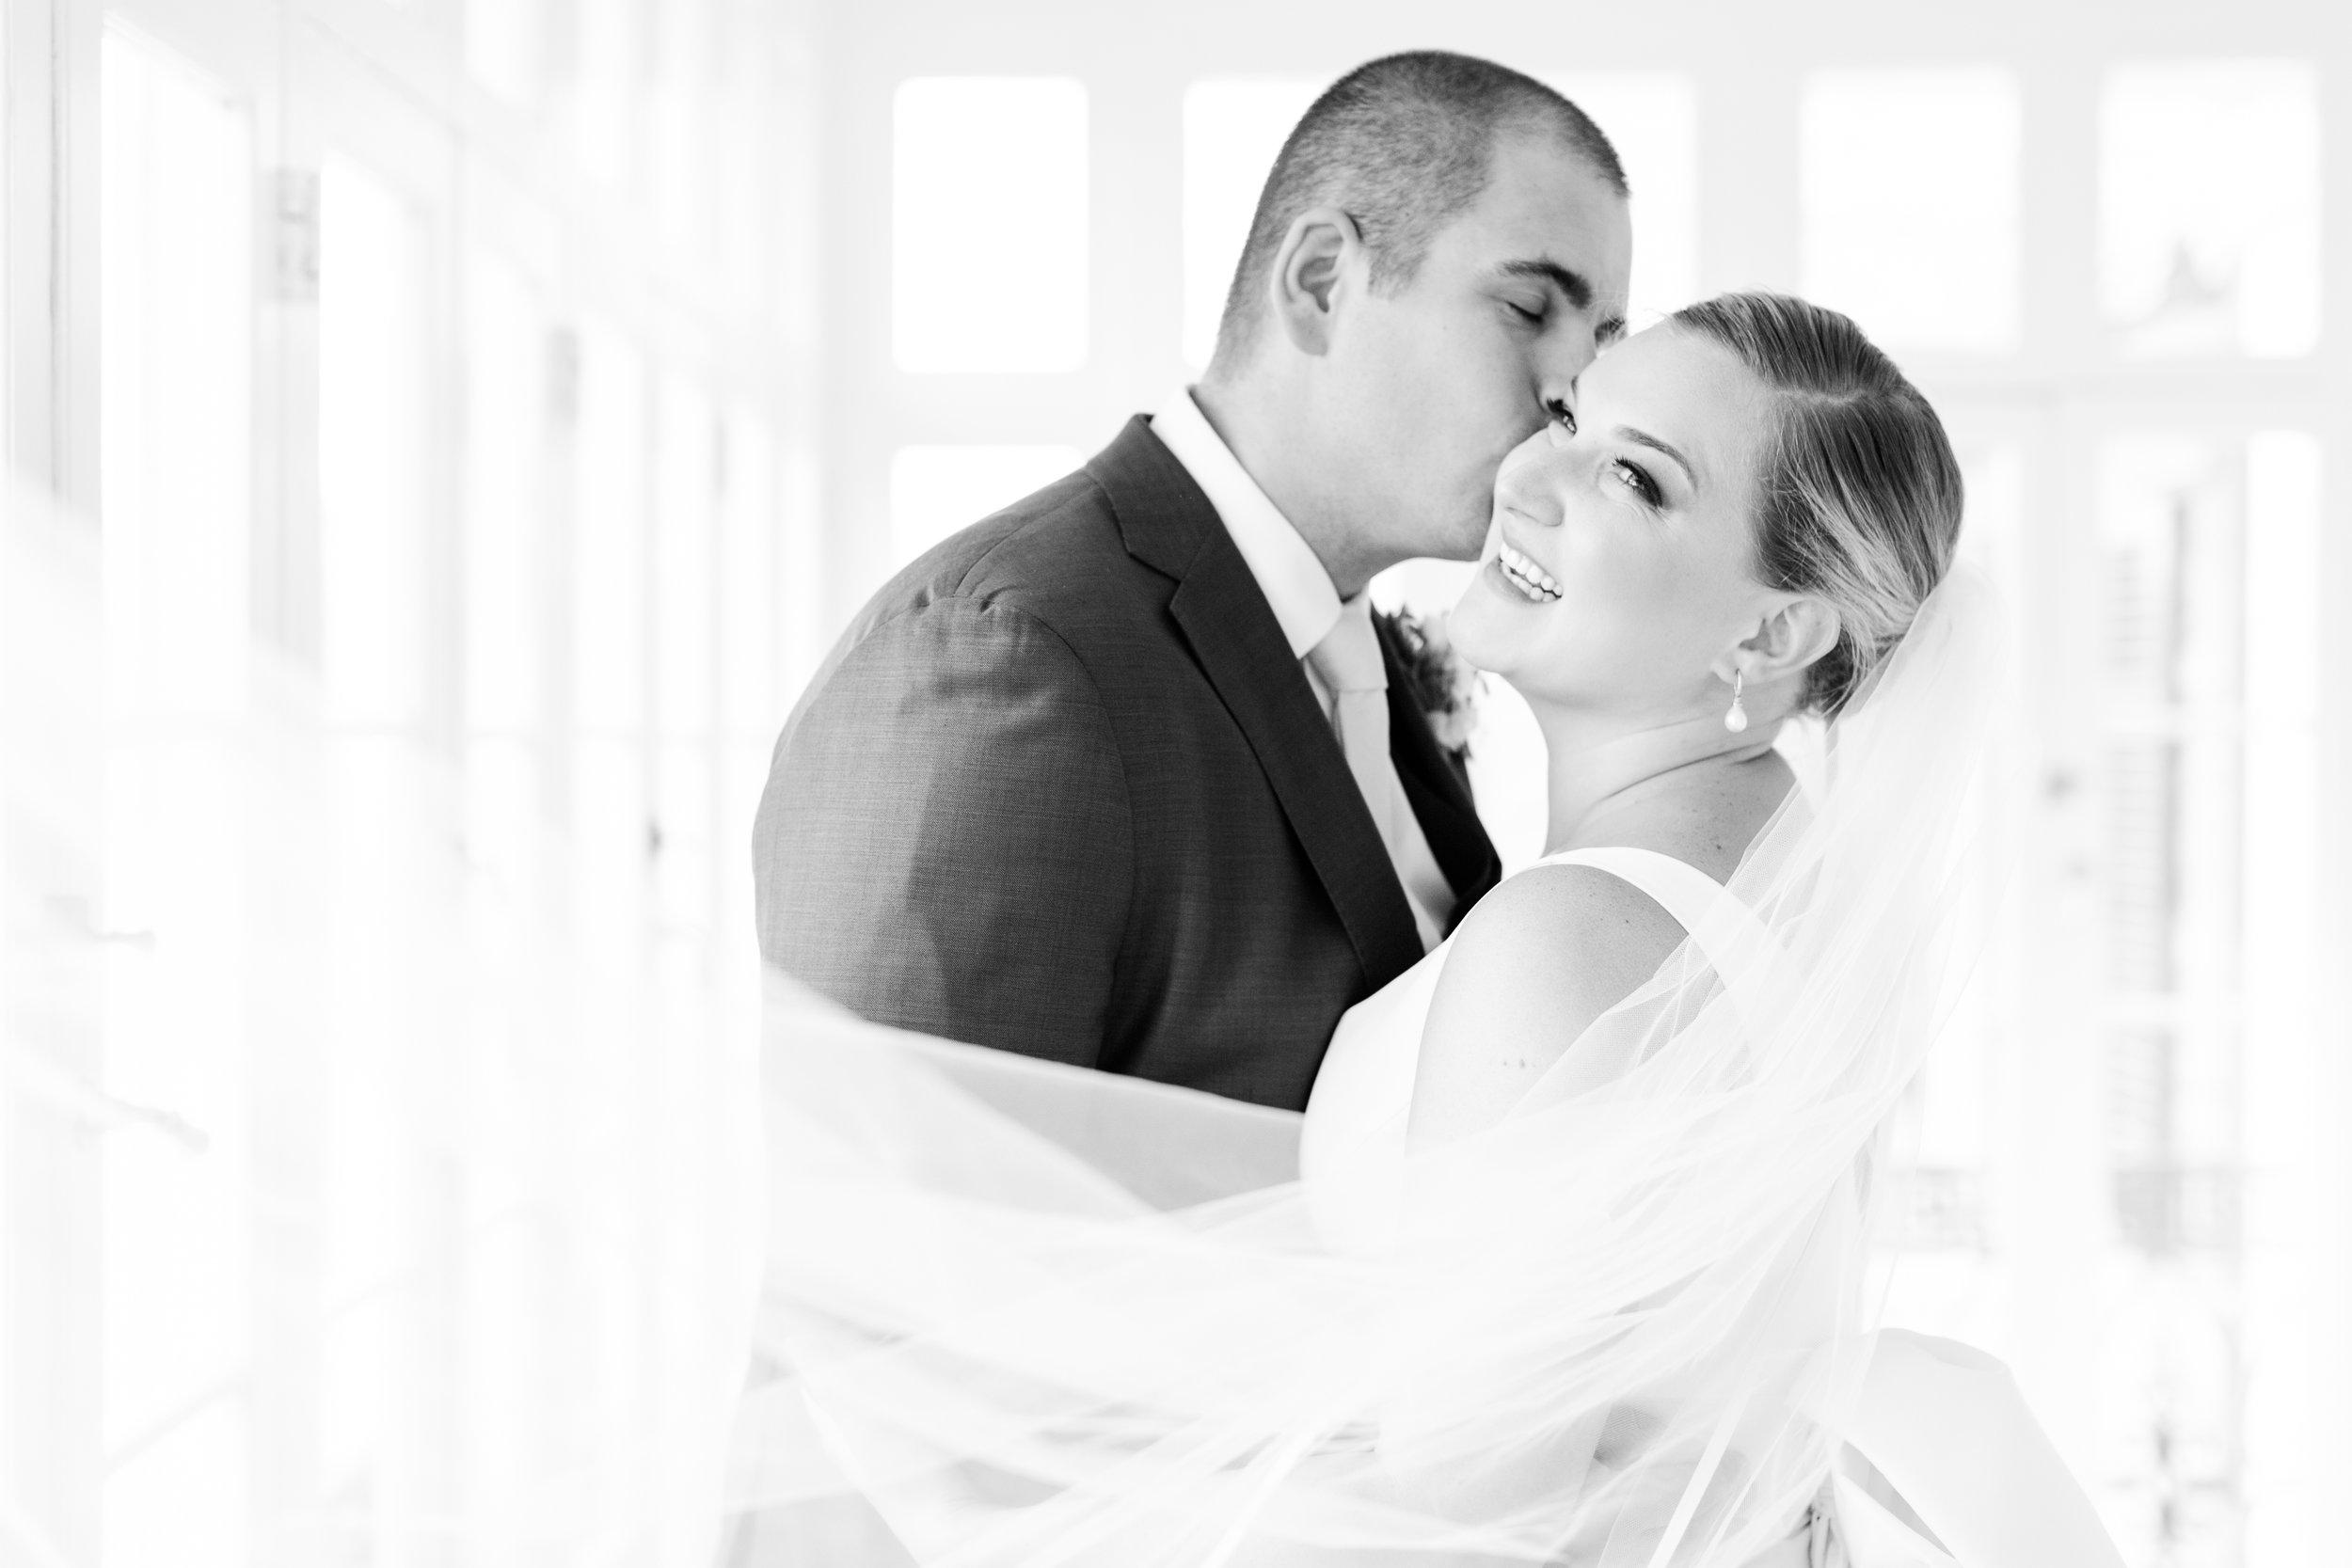 glenview-mansion-rockville-maryland-bourbon-derby-buker-wedding-bride-groom-portraitsbethanne-arthur-photography-photos-121.jpg